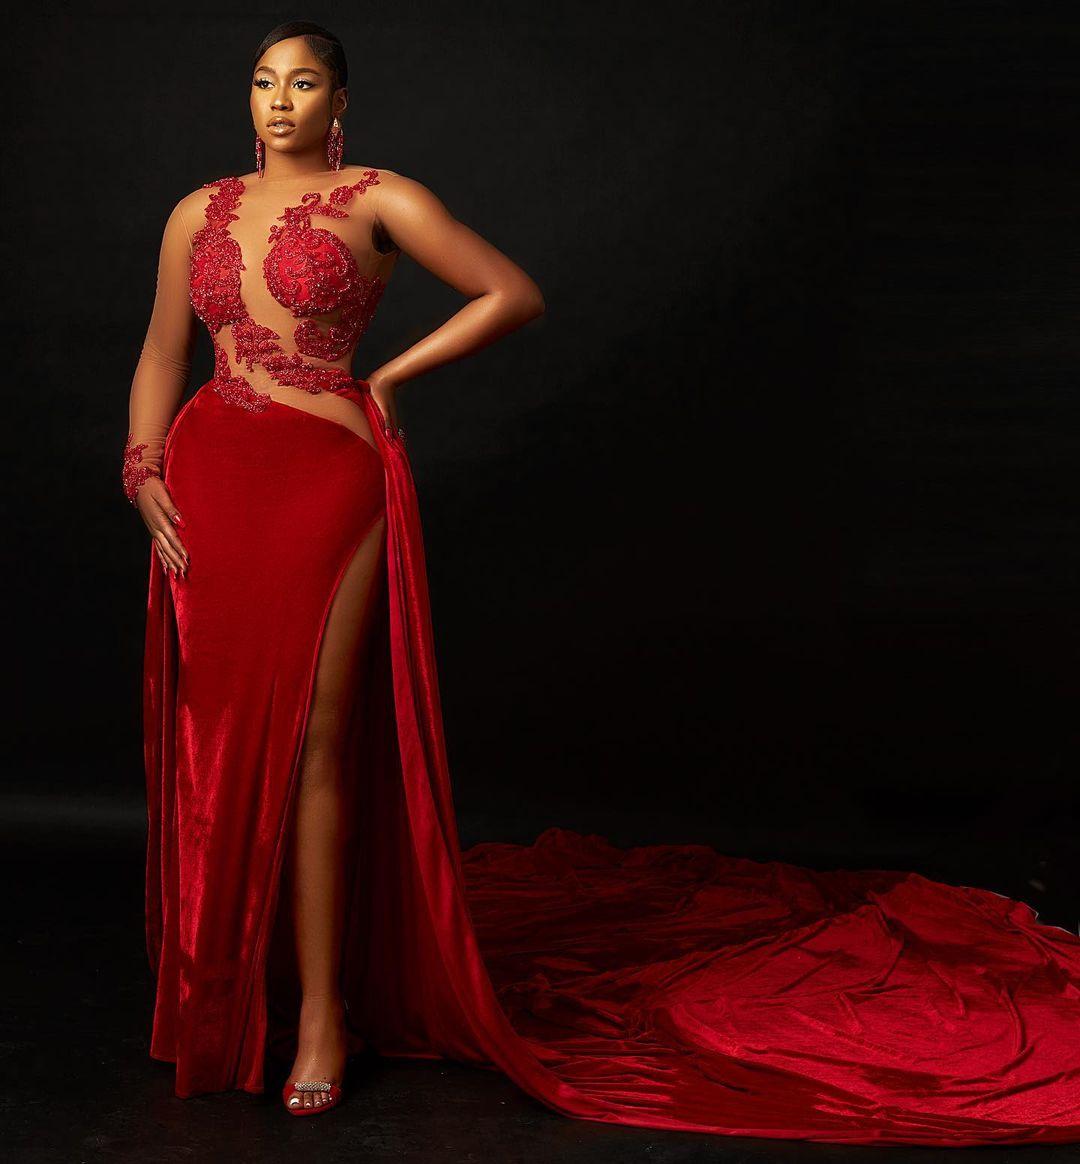 Nigerian female celebrities